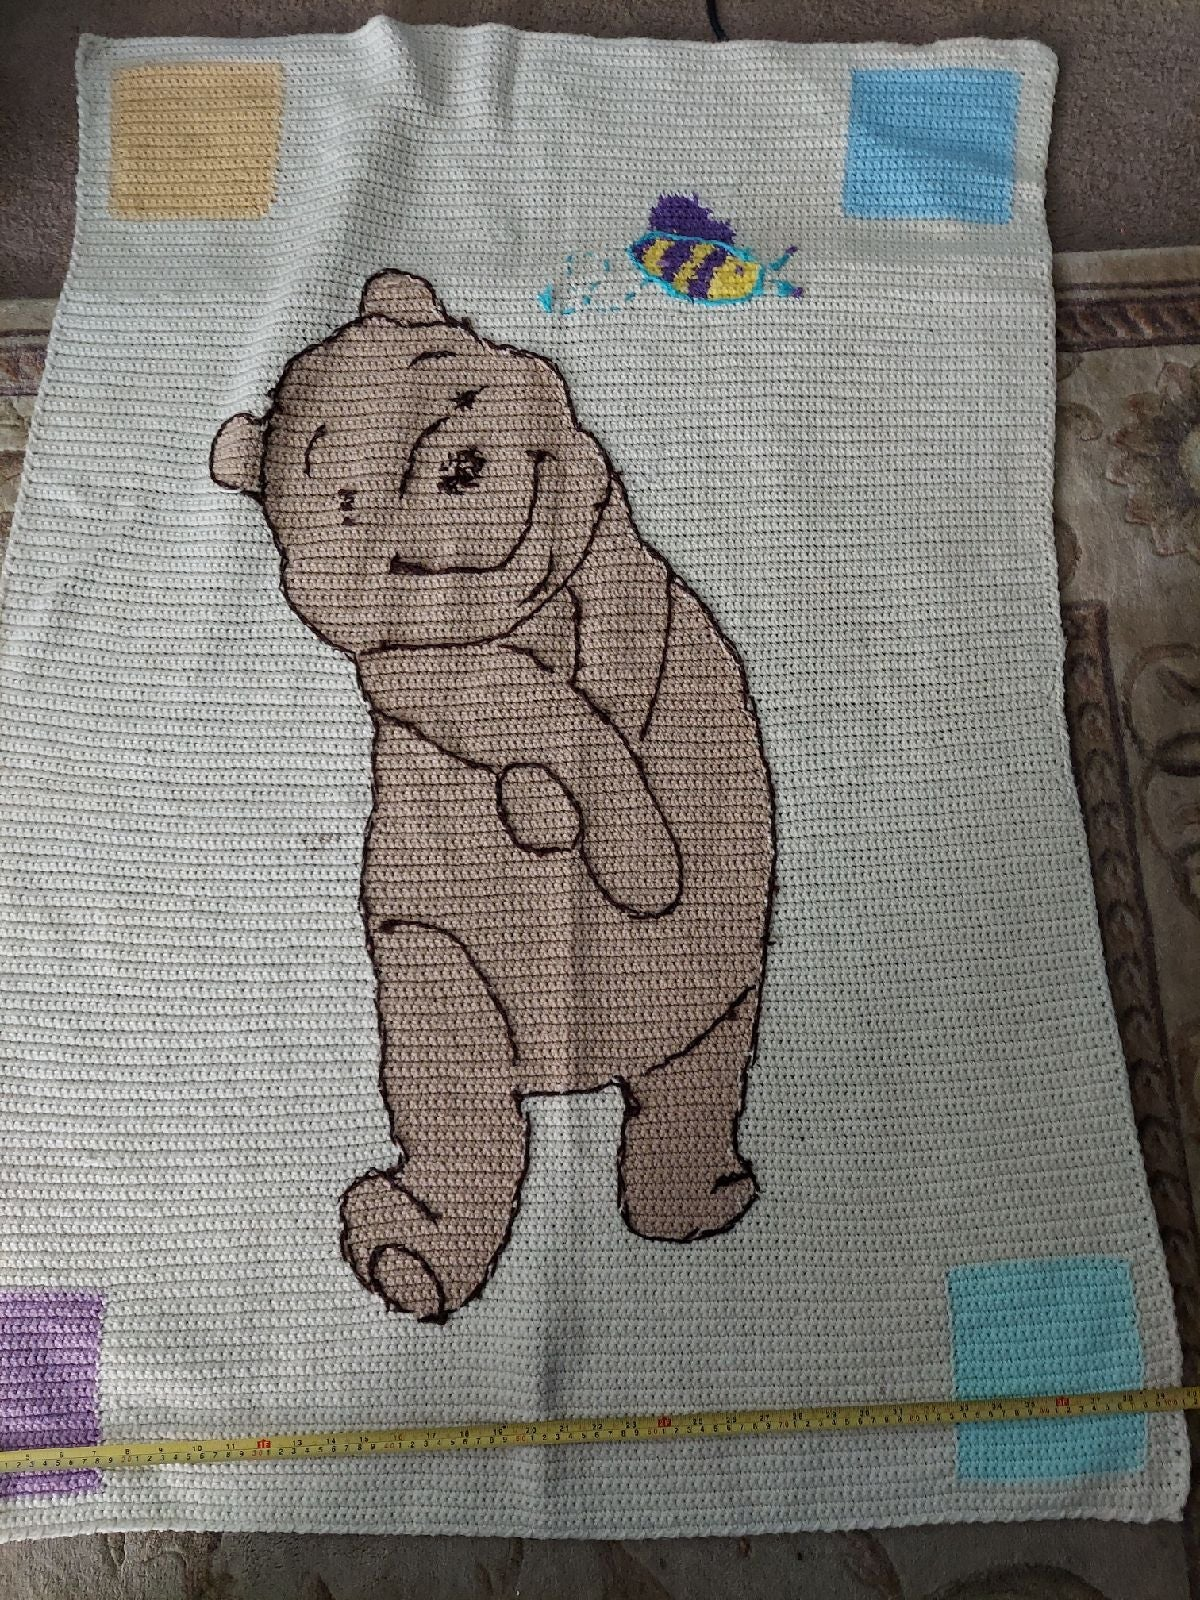 Winnie the pooh handmade blanket